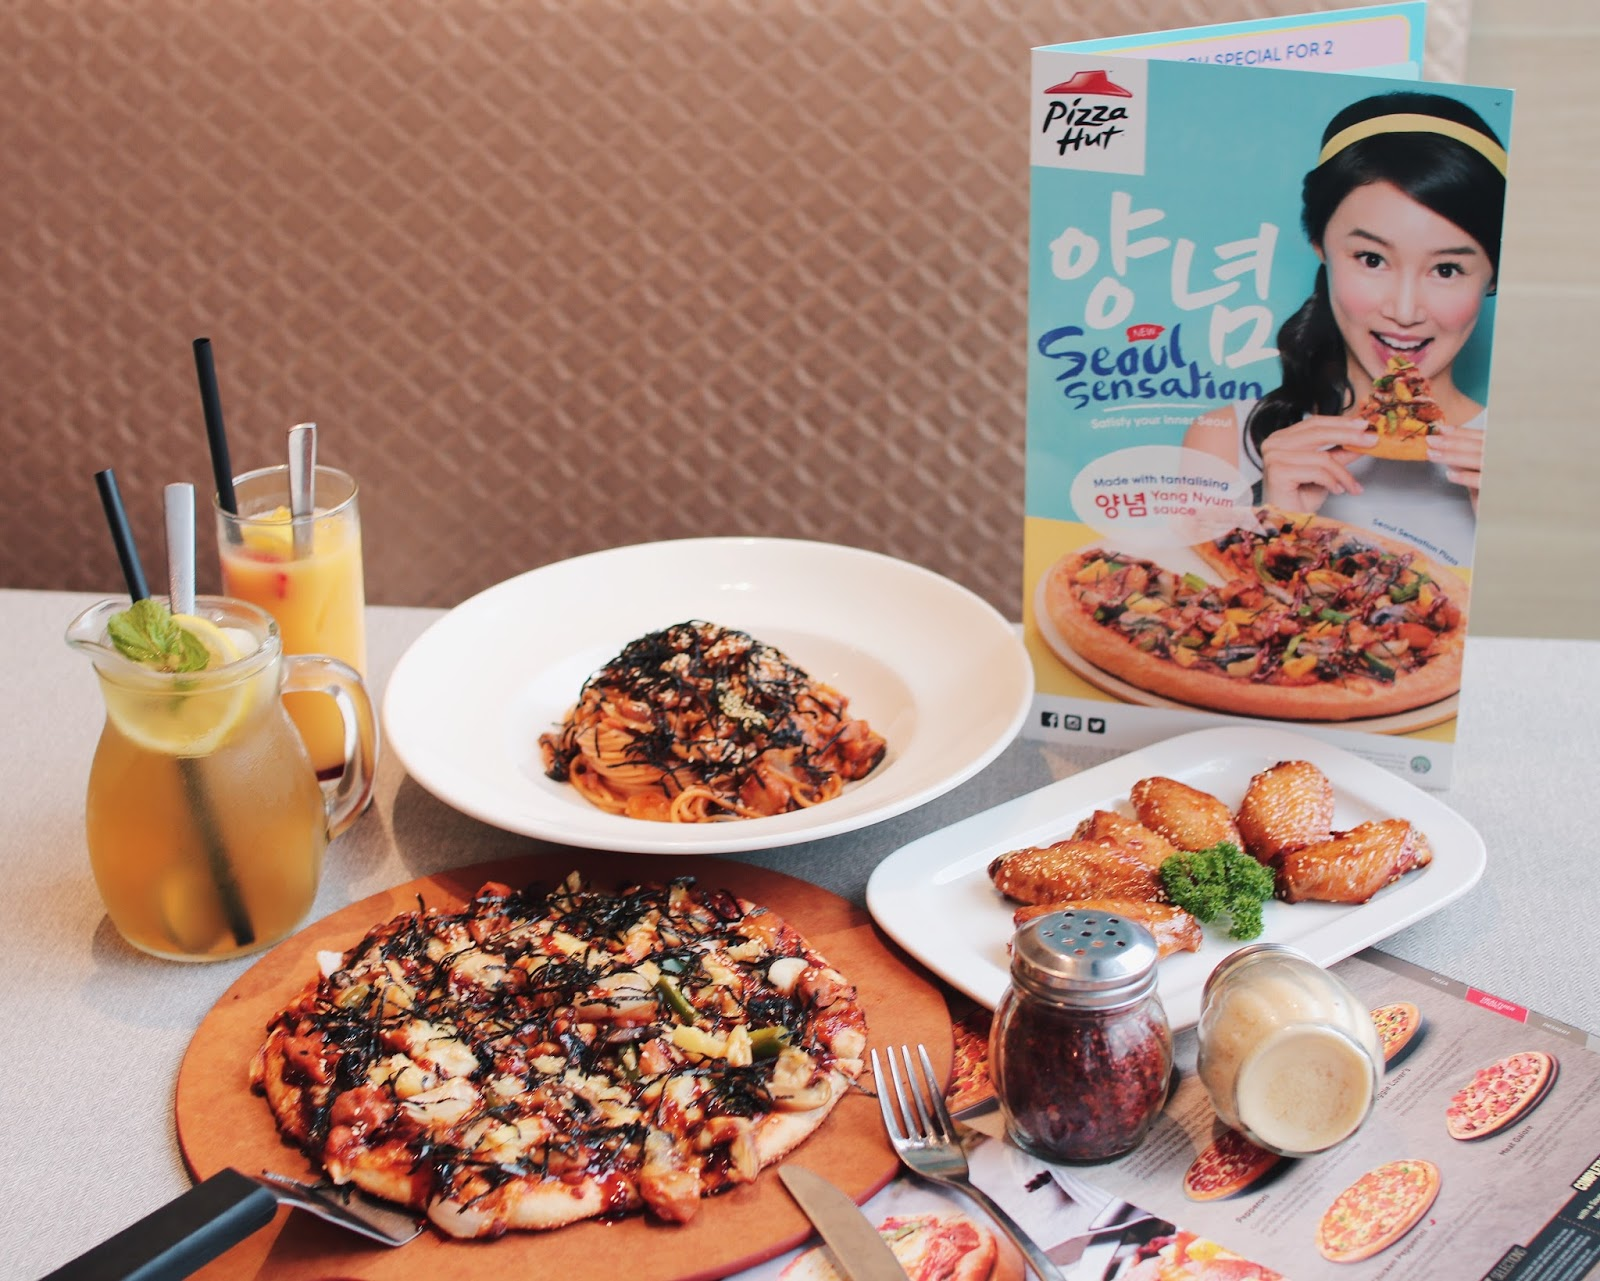 east point, pizza hut, seoul pizza menu, pizzahut